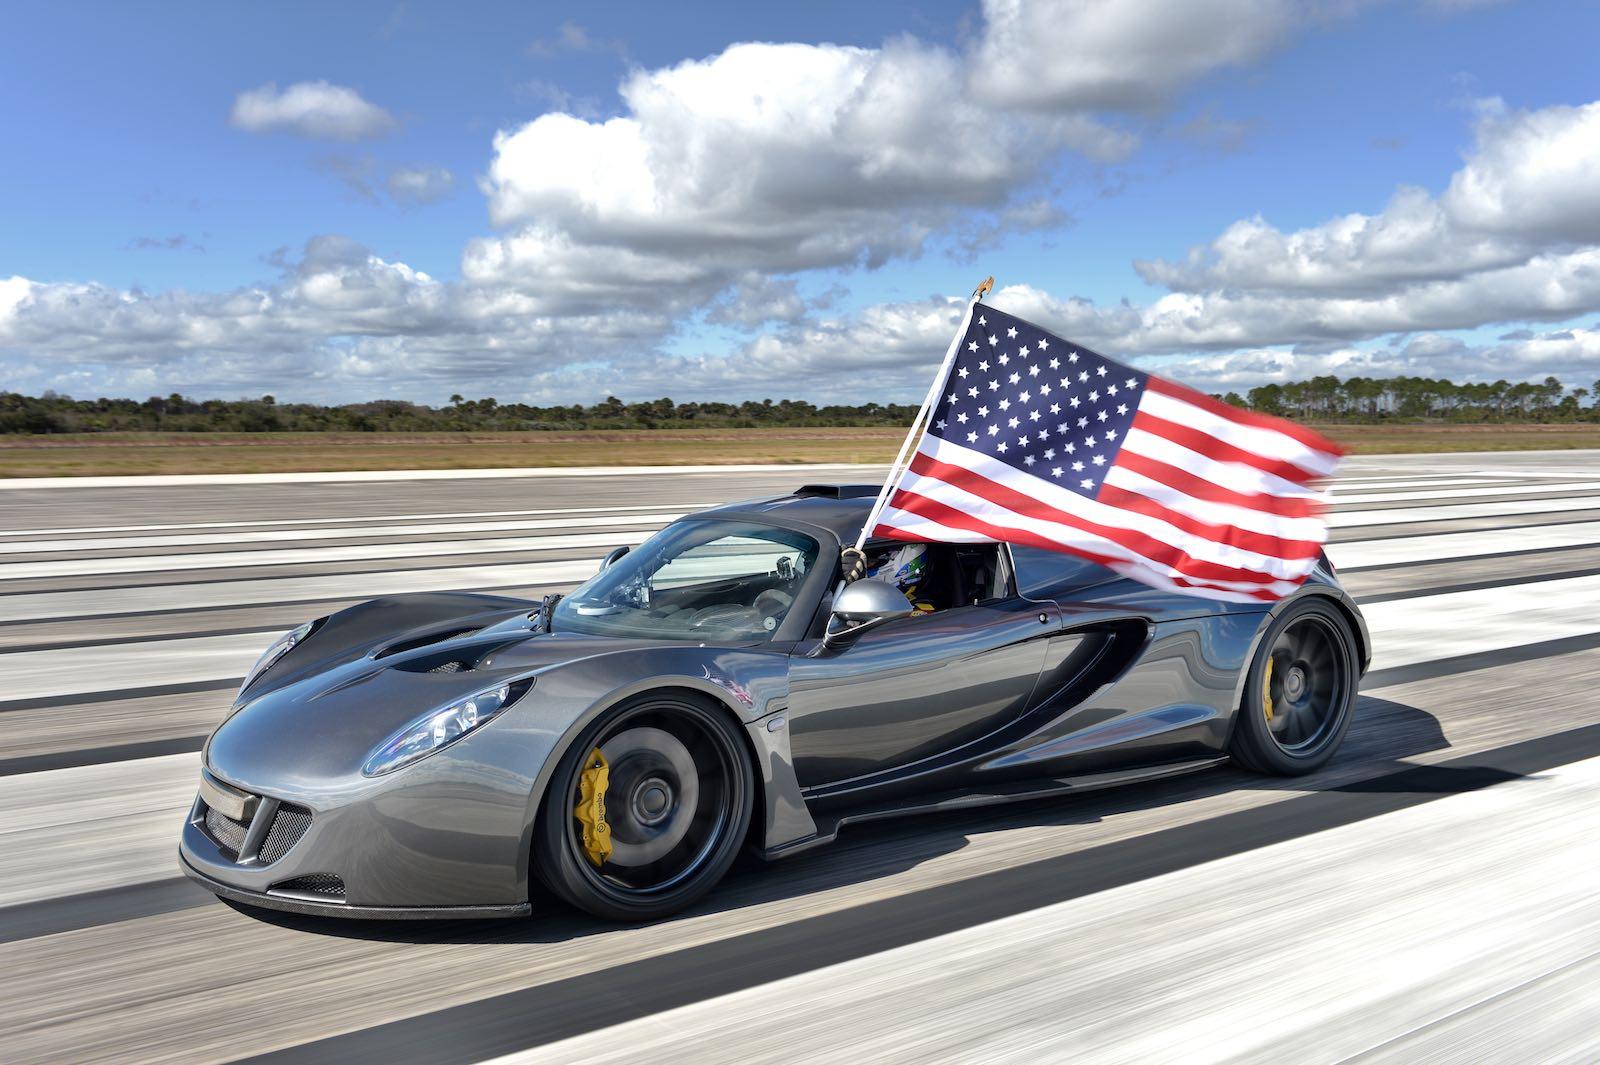 Hennessey Venom GT Το γρηγορότερο αυτοκίνητο στον κοσμο πιάνει τα 435 χ.α.ω SSC, top speed, topspeed, videos